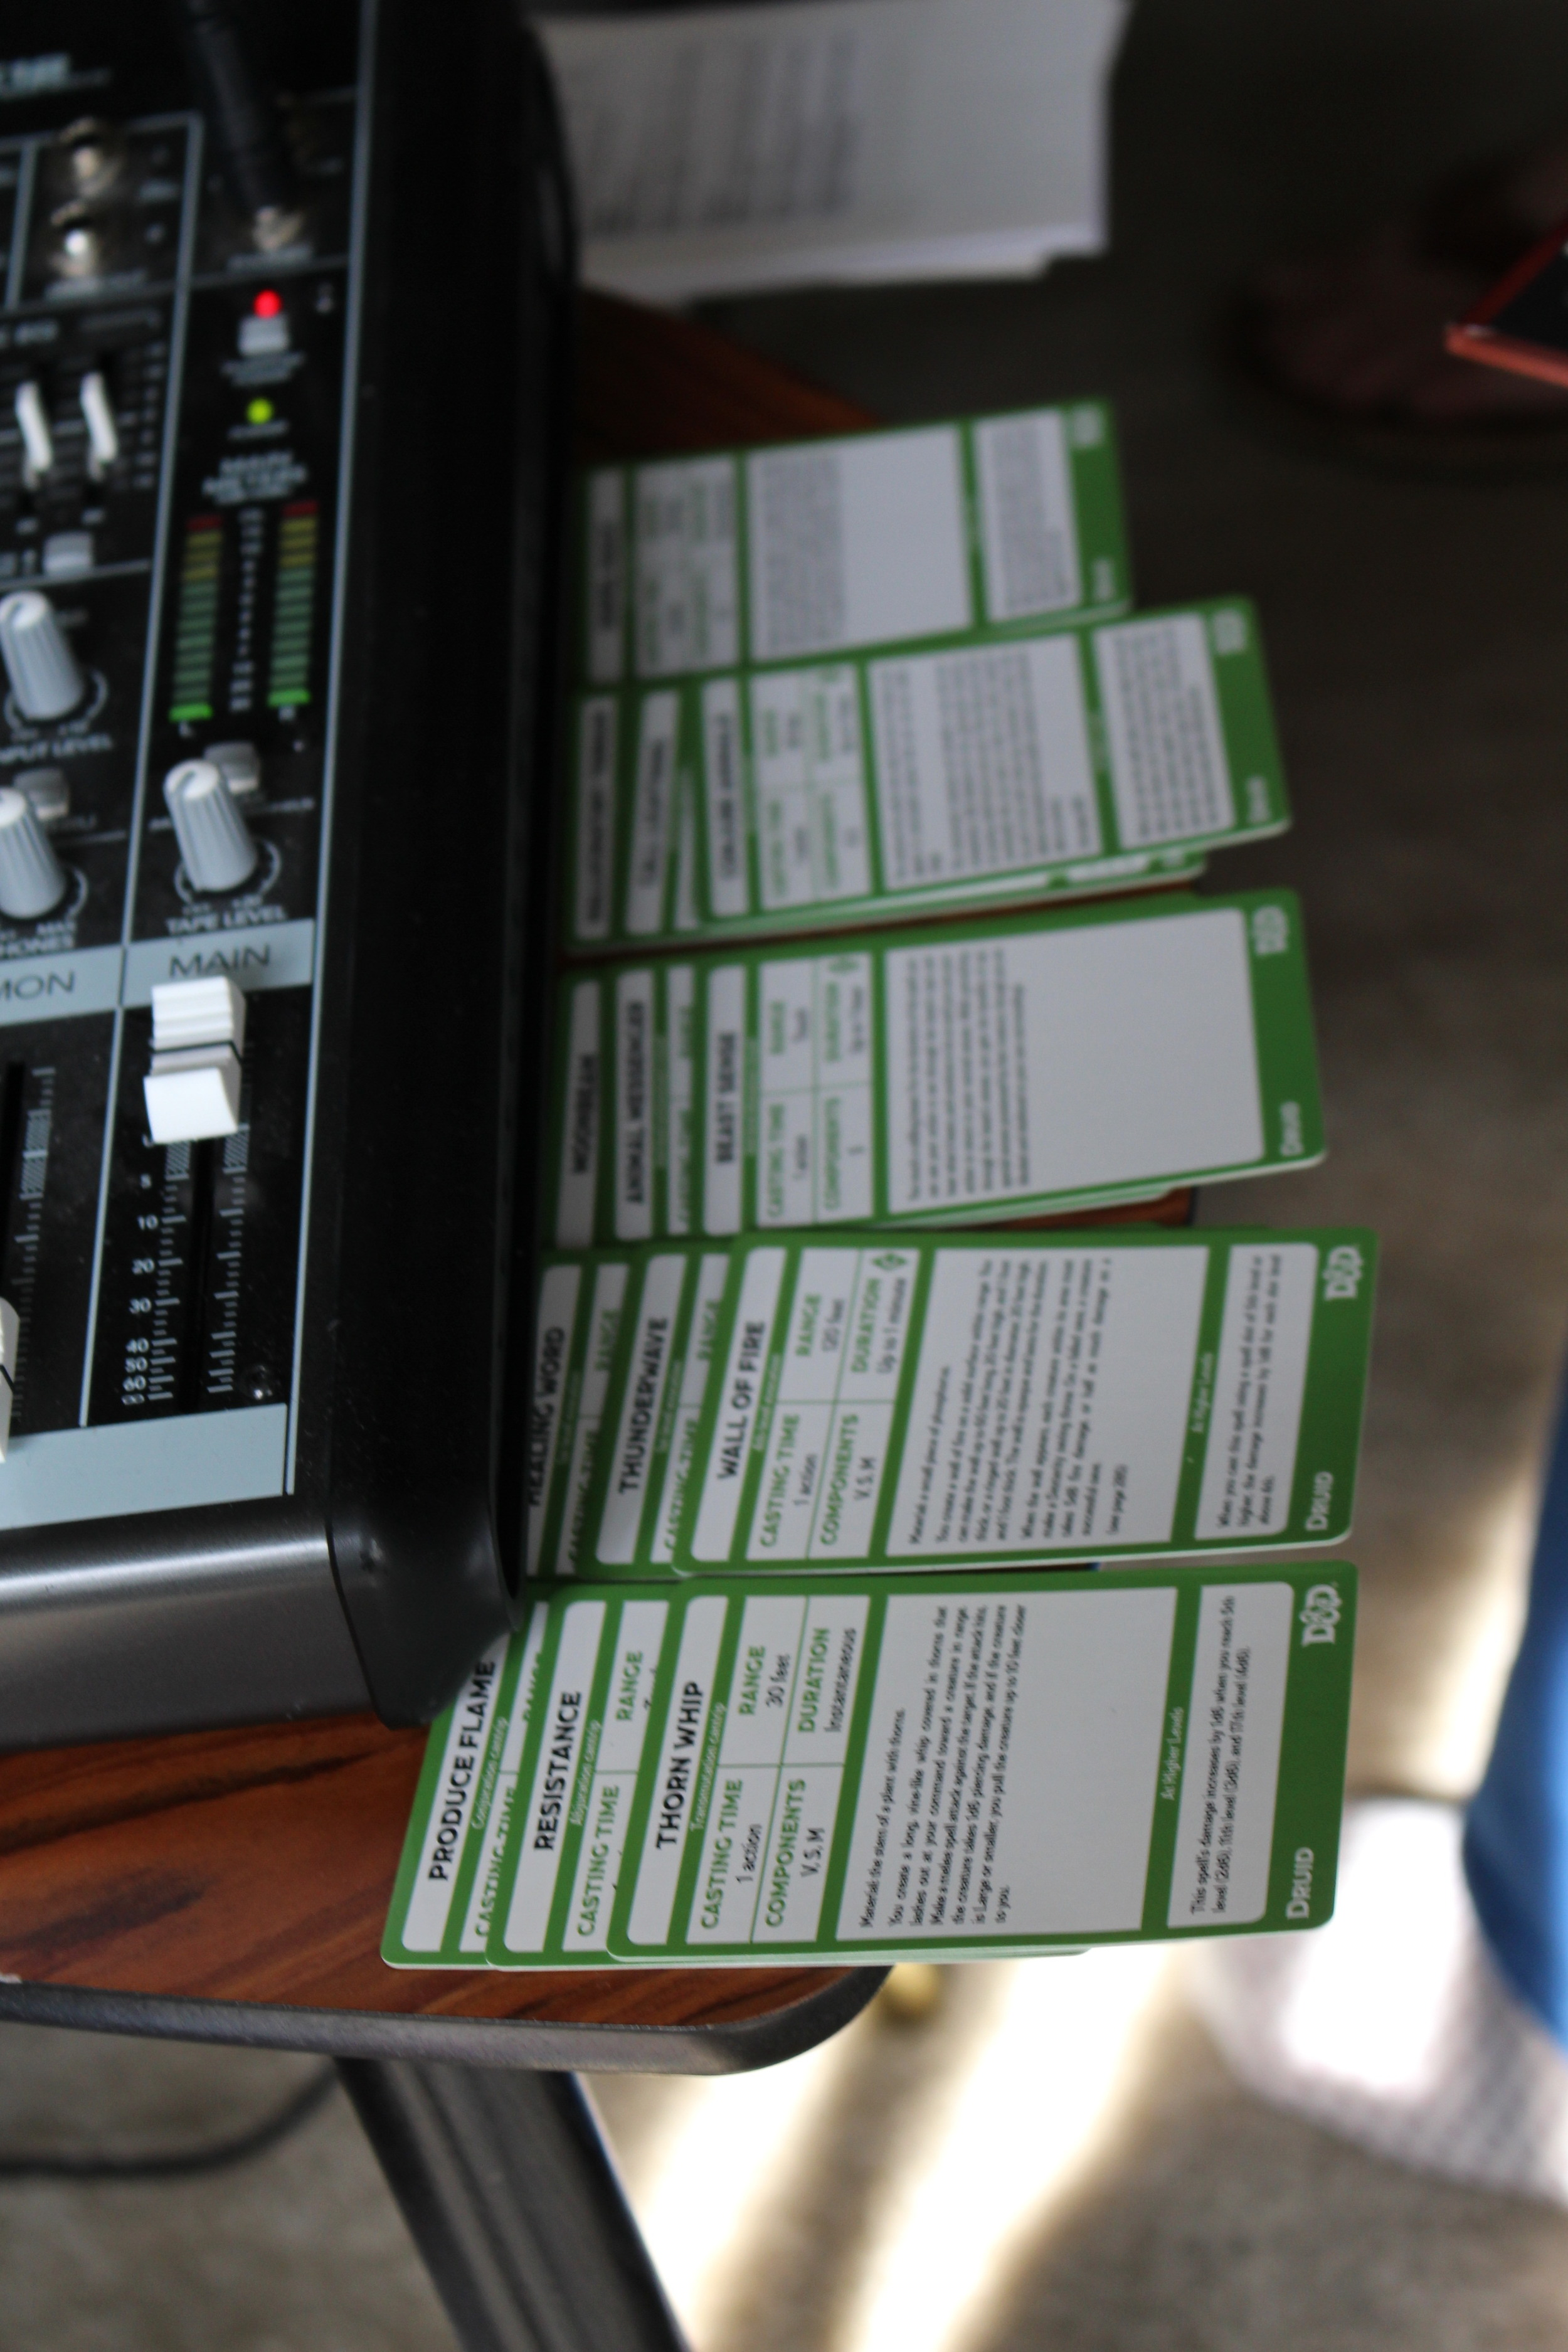 Izzy's spellcasting cards